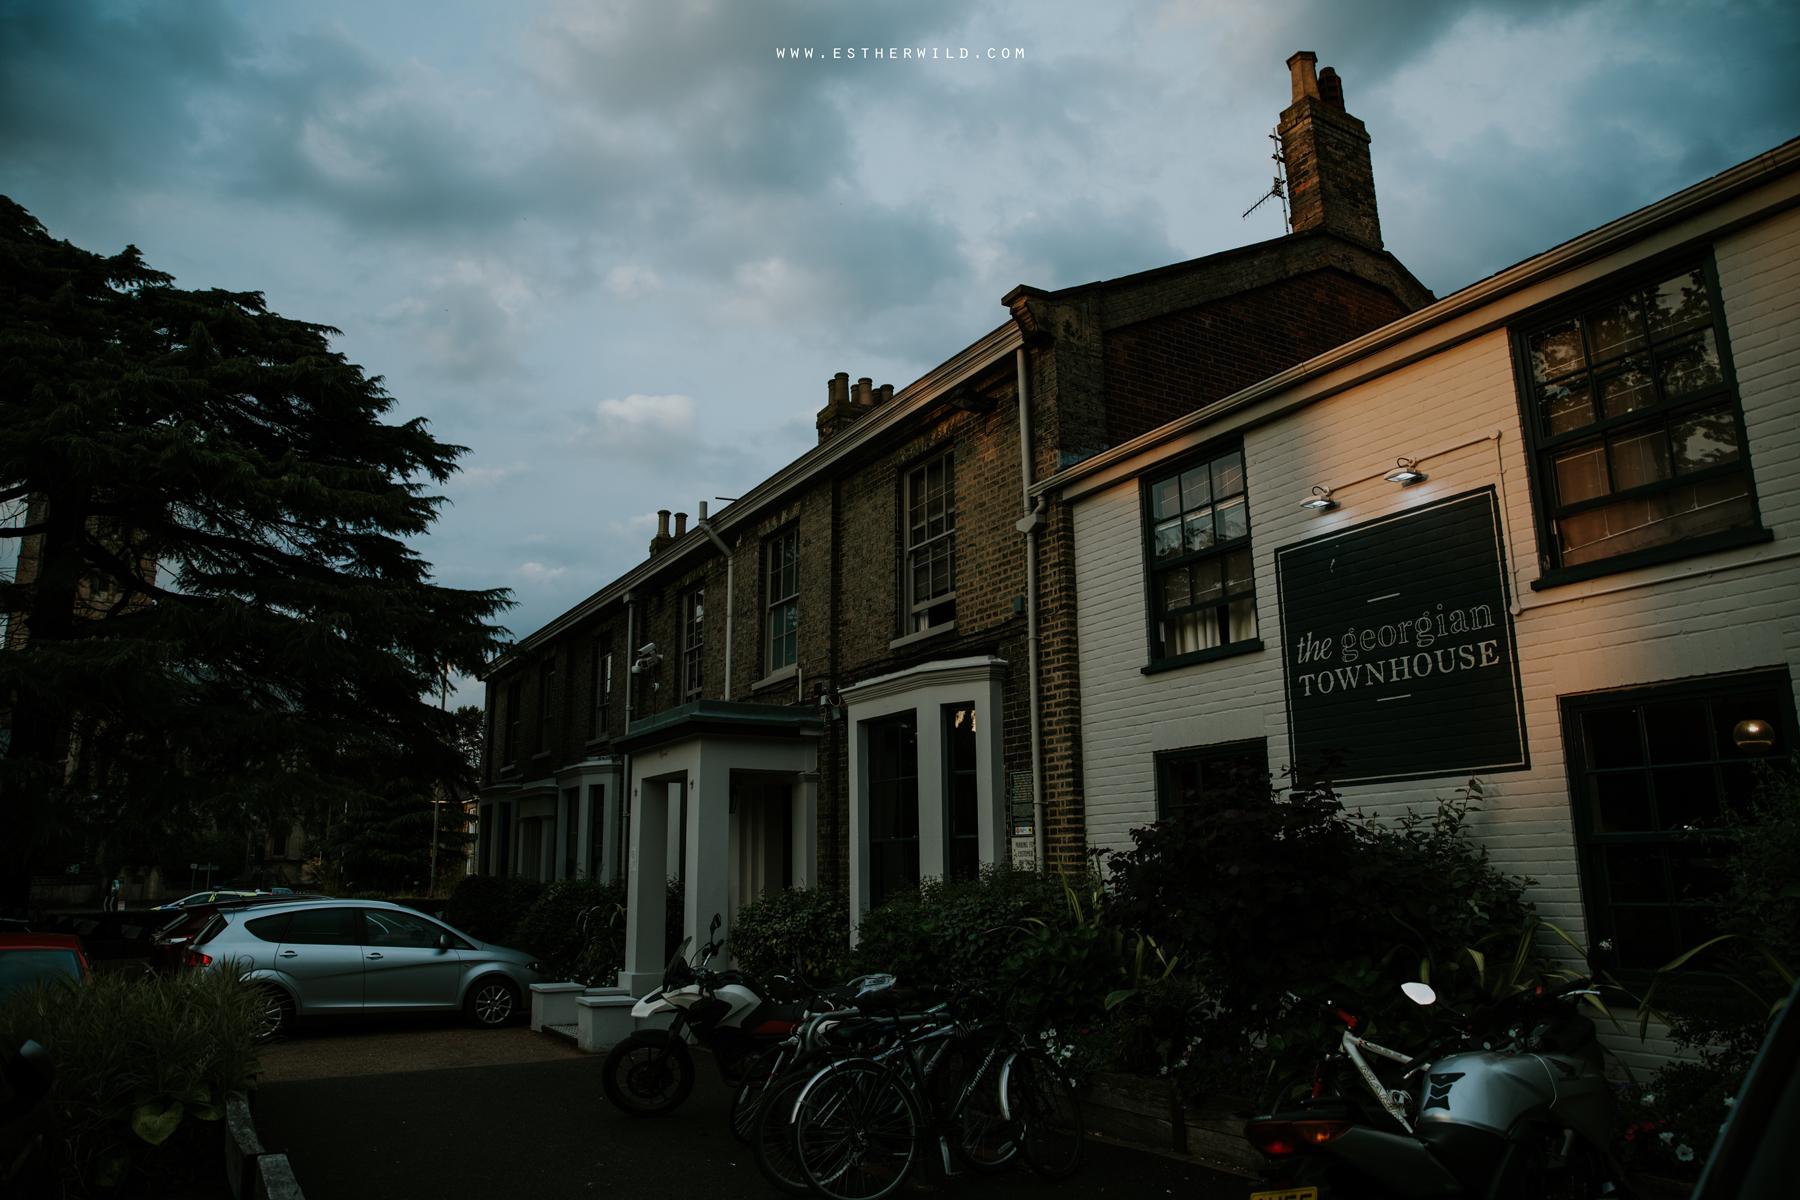 The_Georgian_Townhouse_Wedding_Norwich_Esther_Wild_Photographer_3R8A2859.jpg